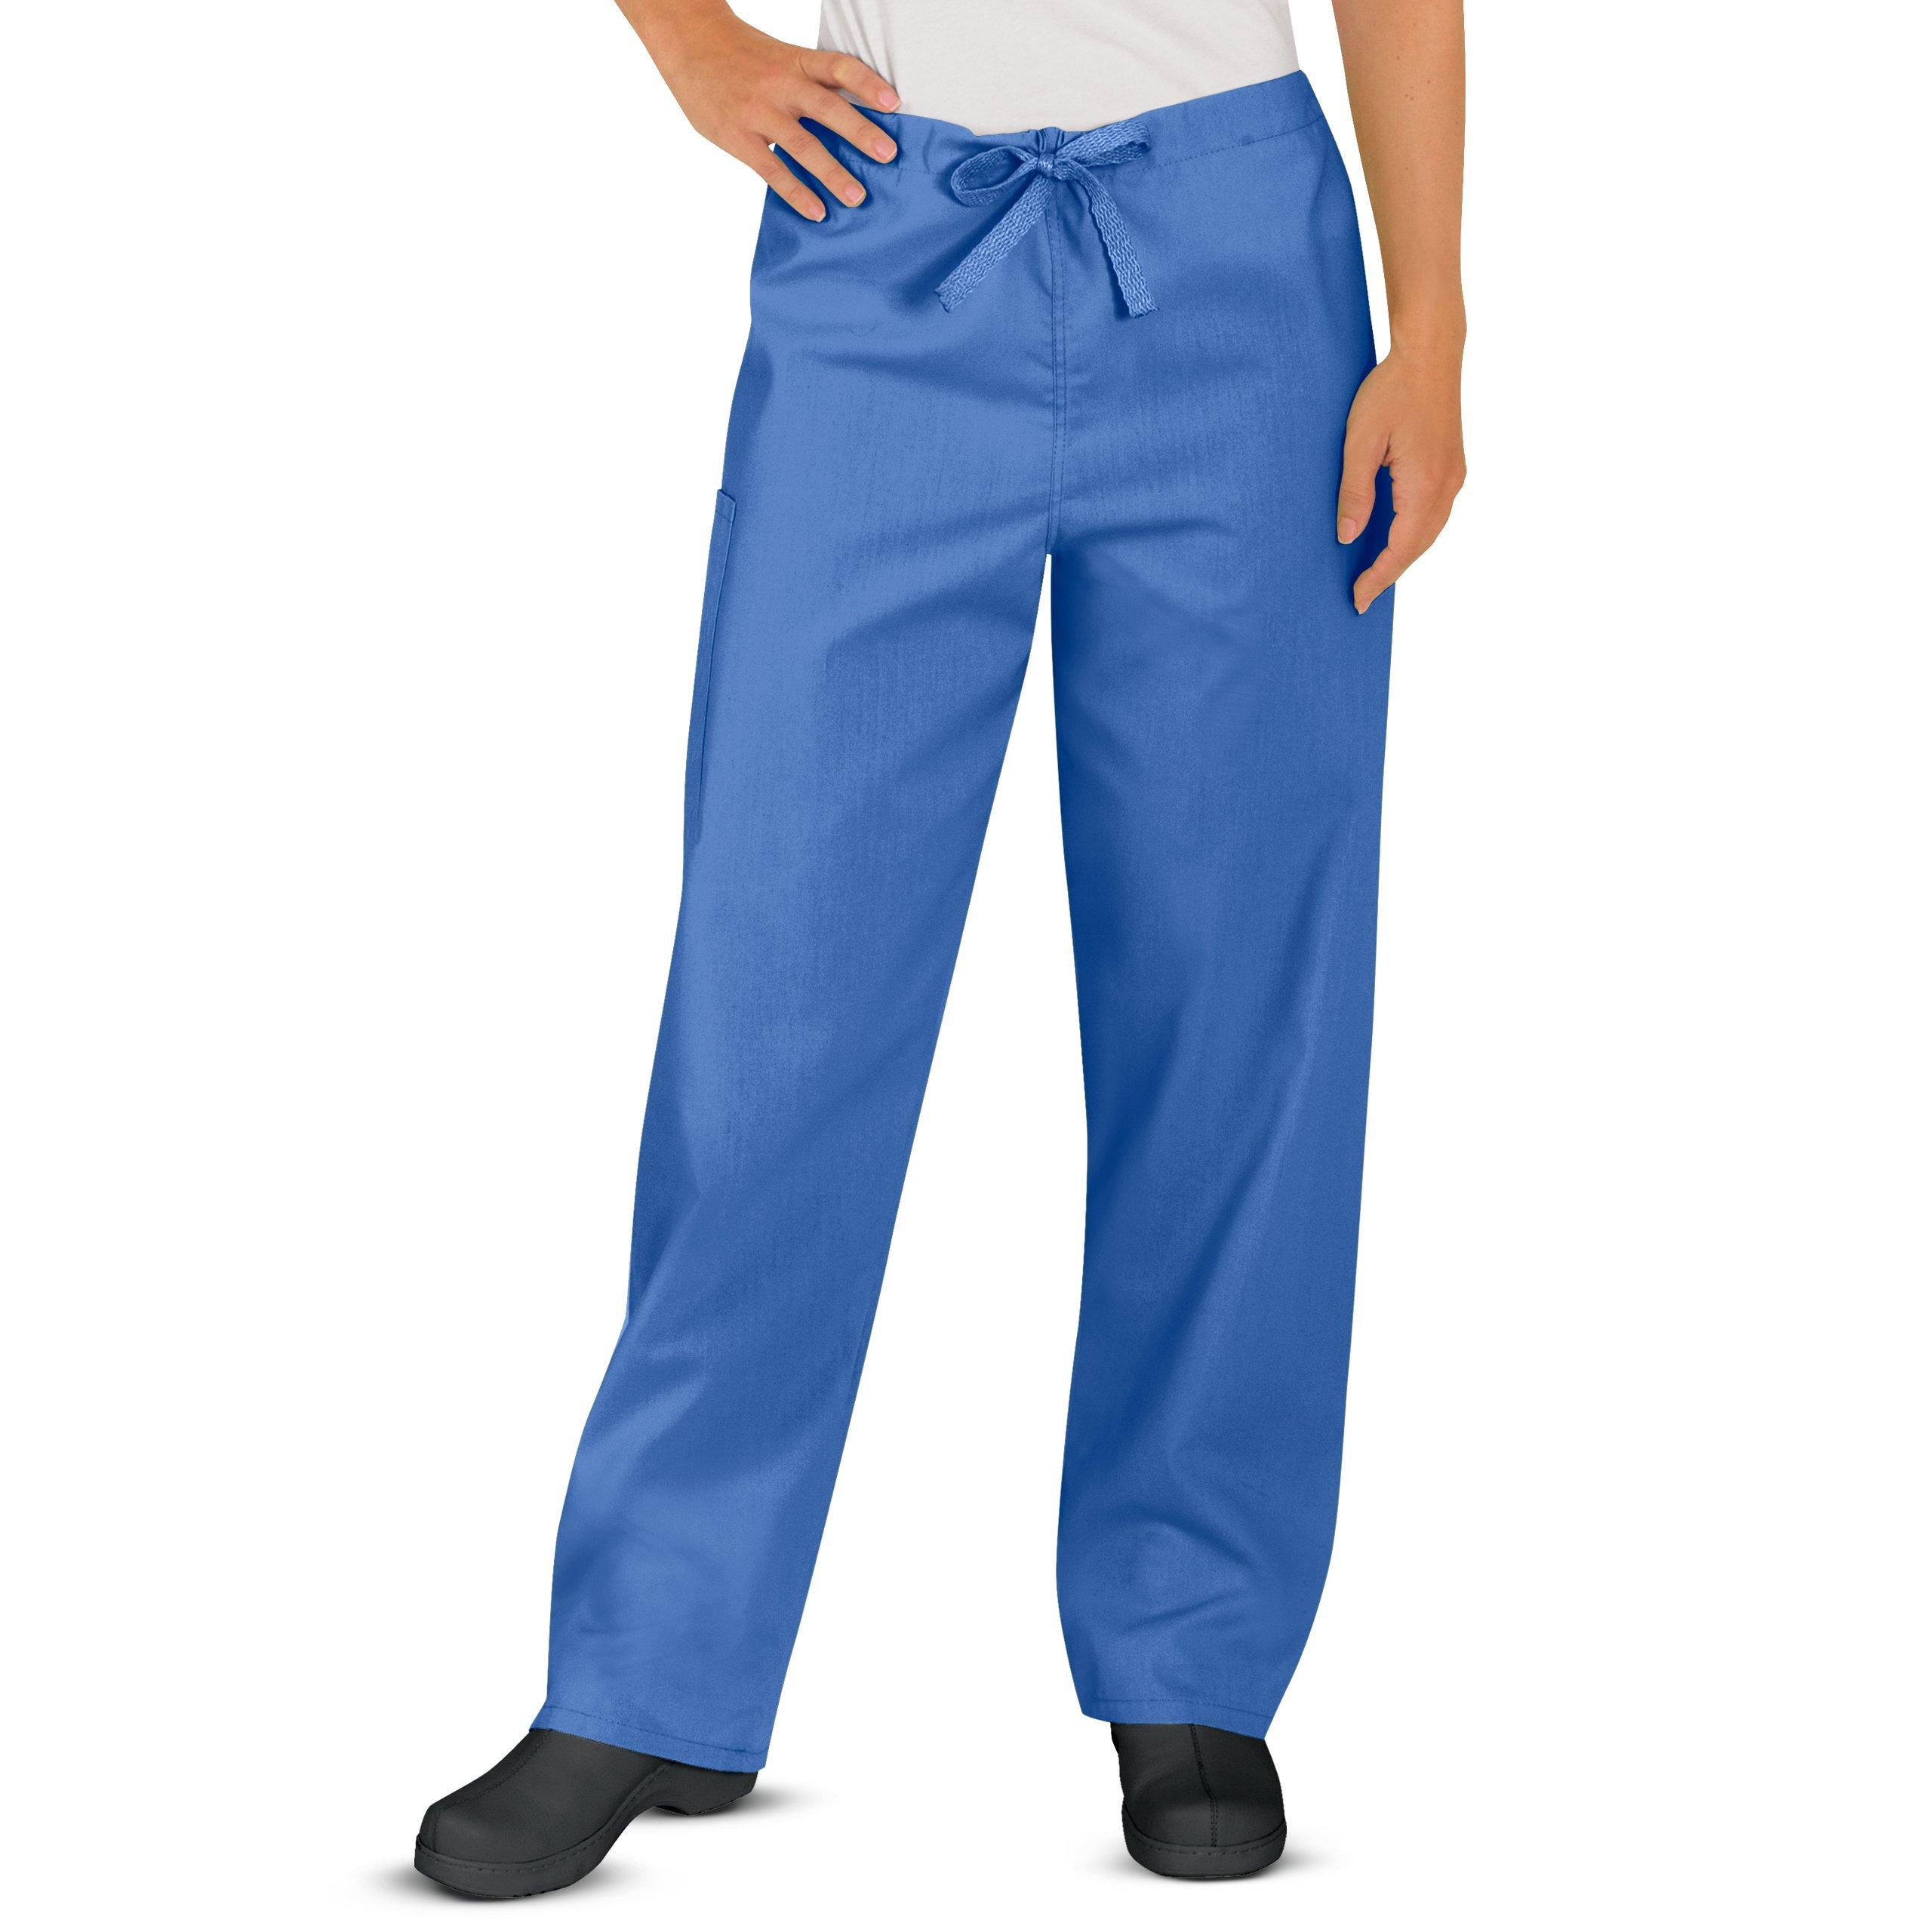 Strictly Scrubs Unisex Medical Uniform Set (Medium, Ceil) by Strictly Scrubs (Image #7)